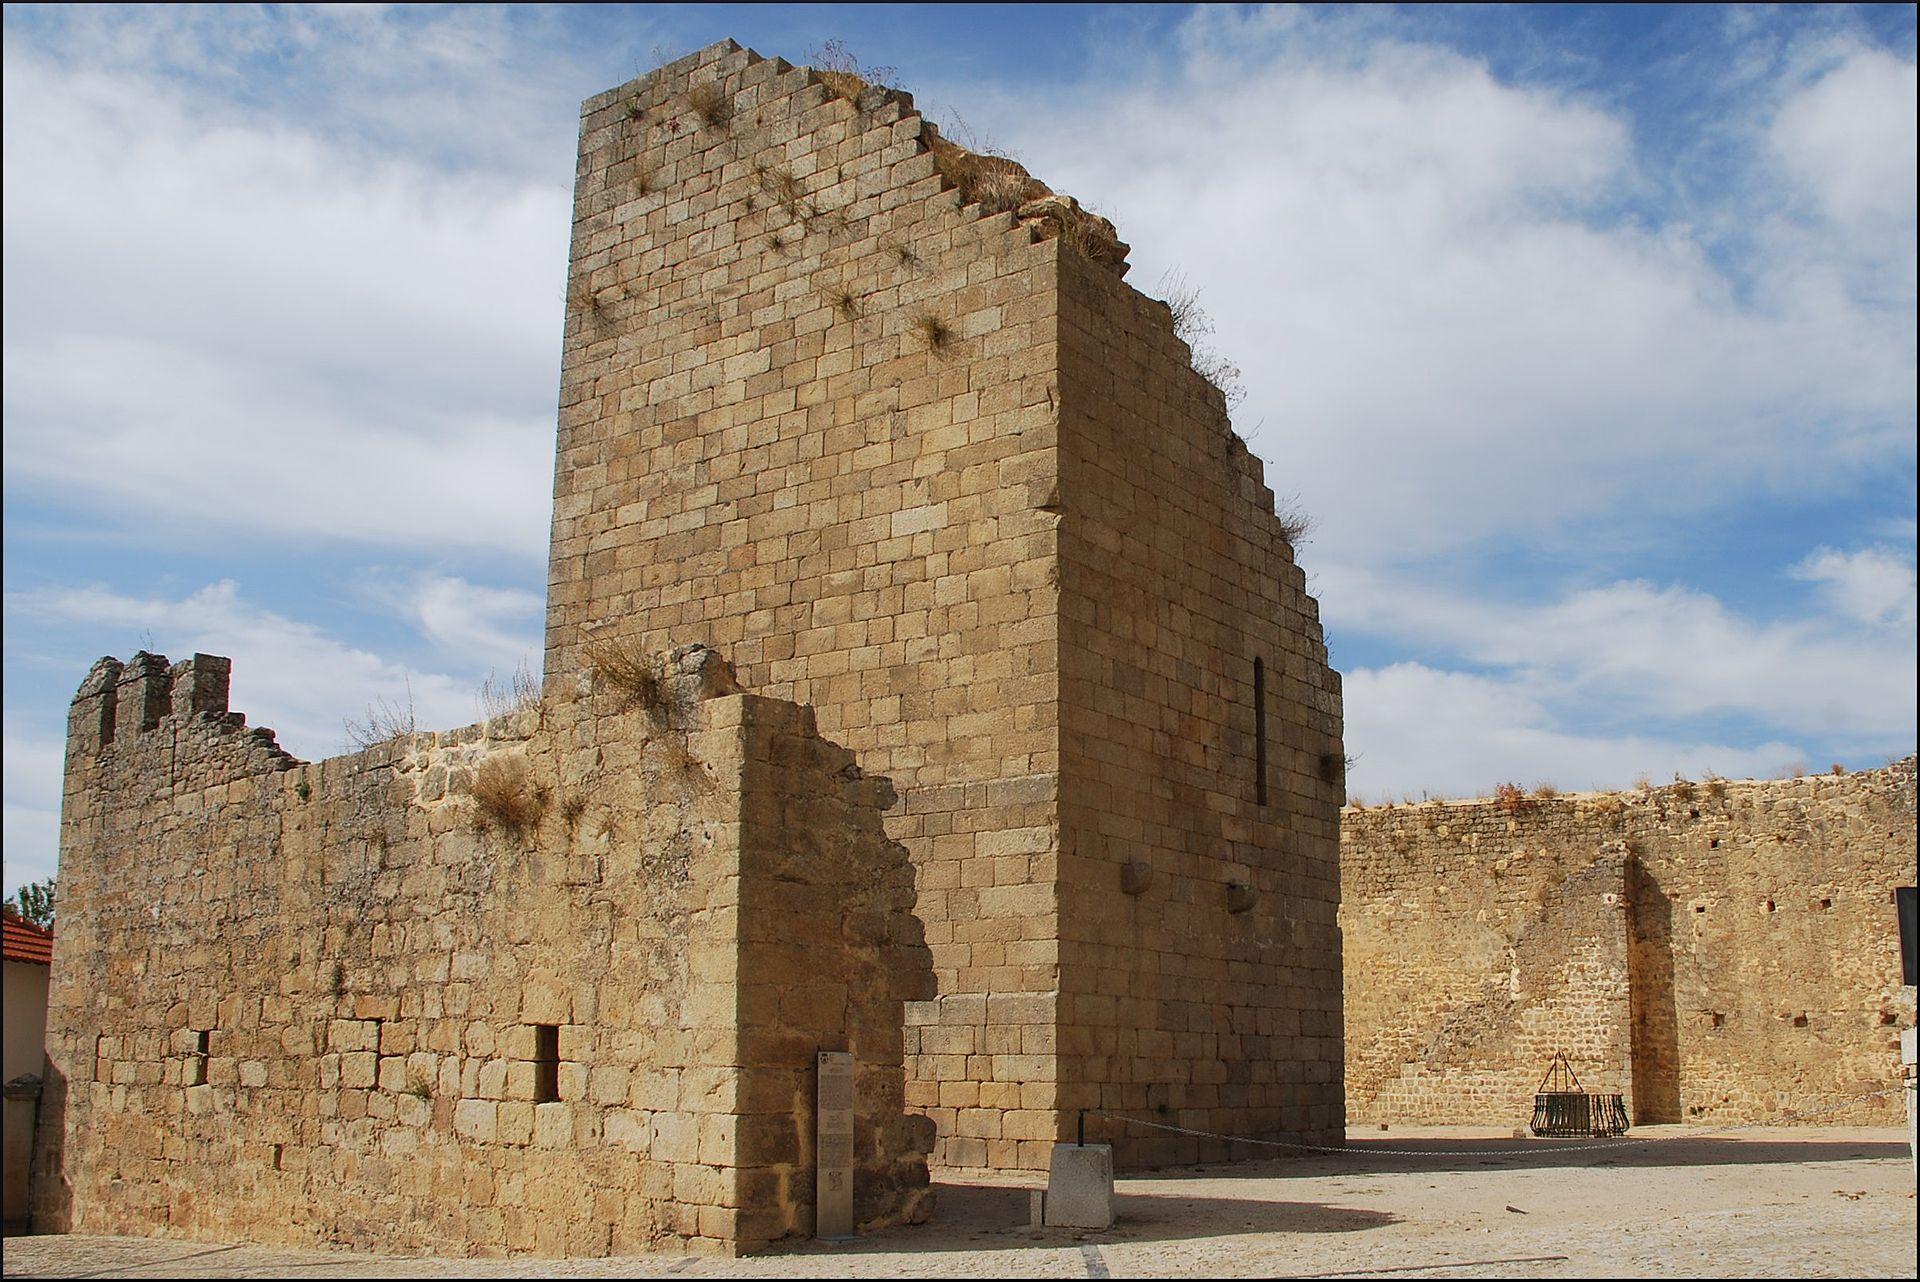 Castillo de Miranda do Douro - DSC 8090.JPG